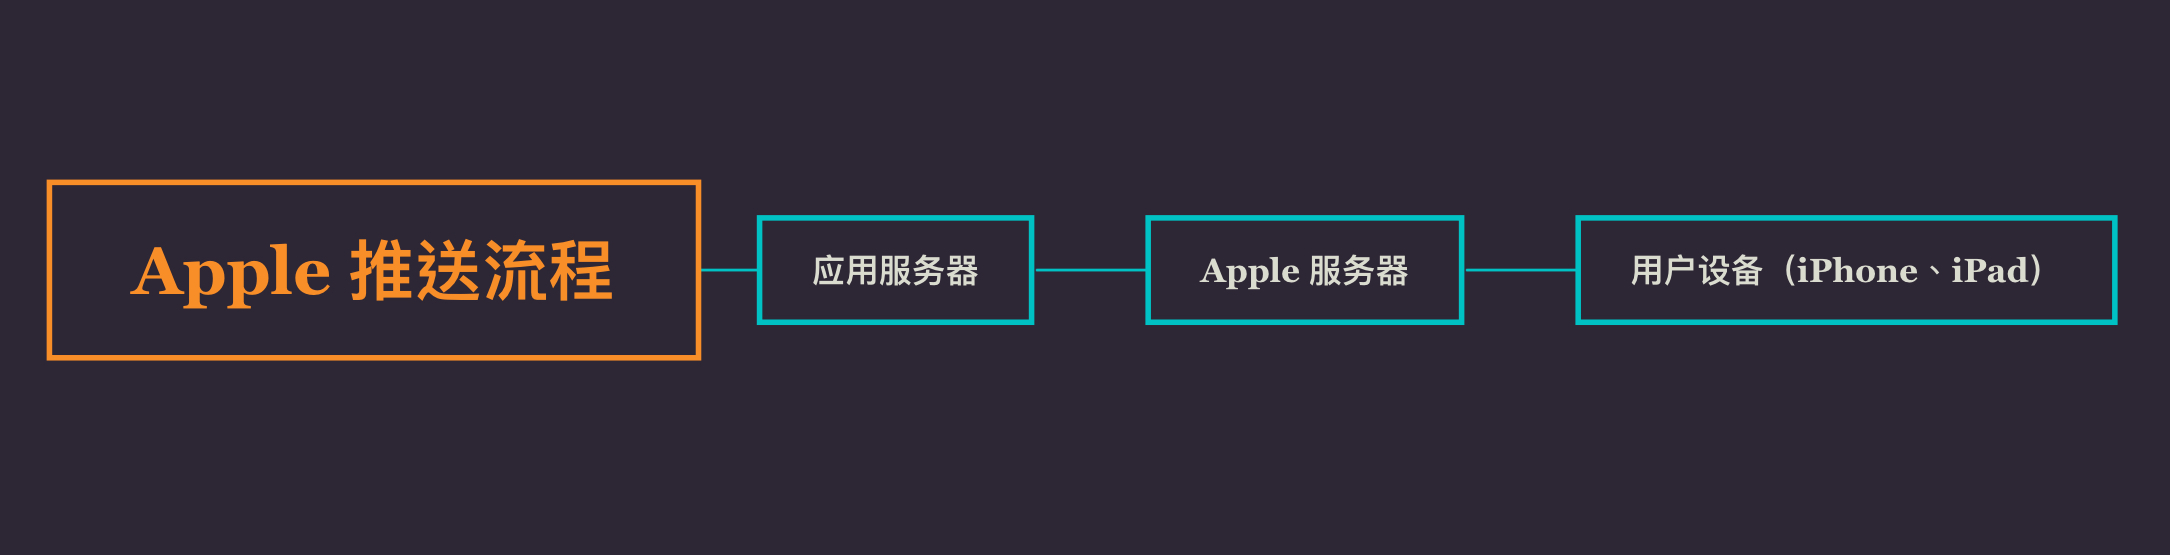 Apple 推送通知服务的推送流程